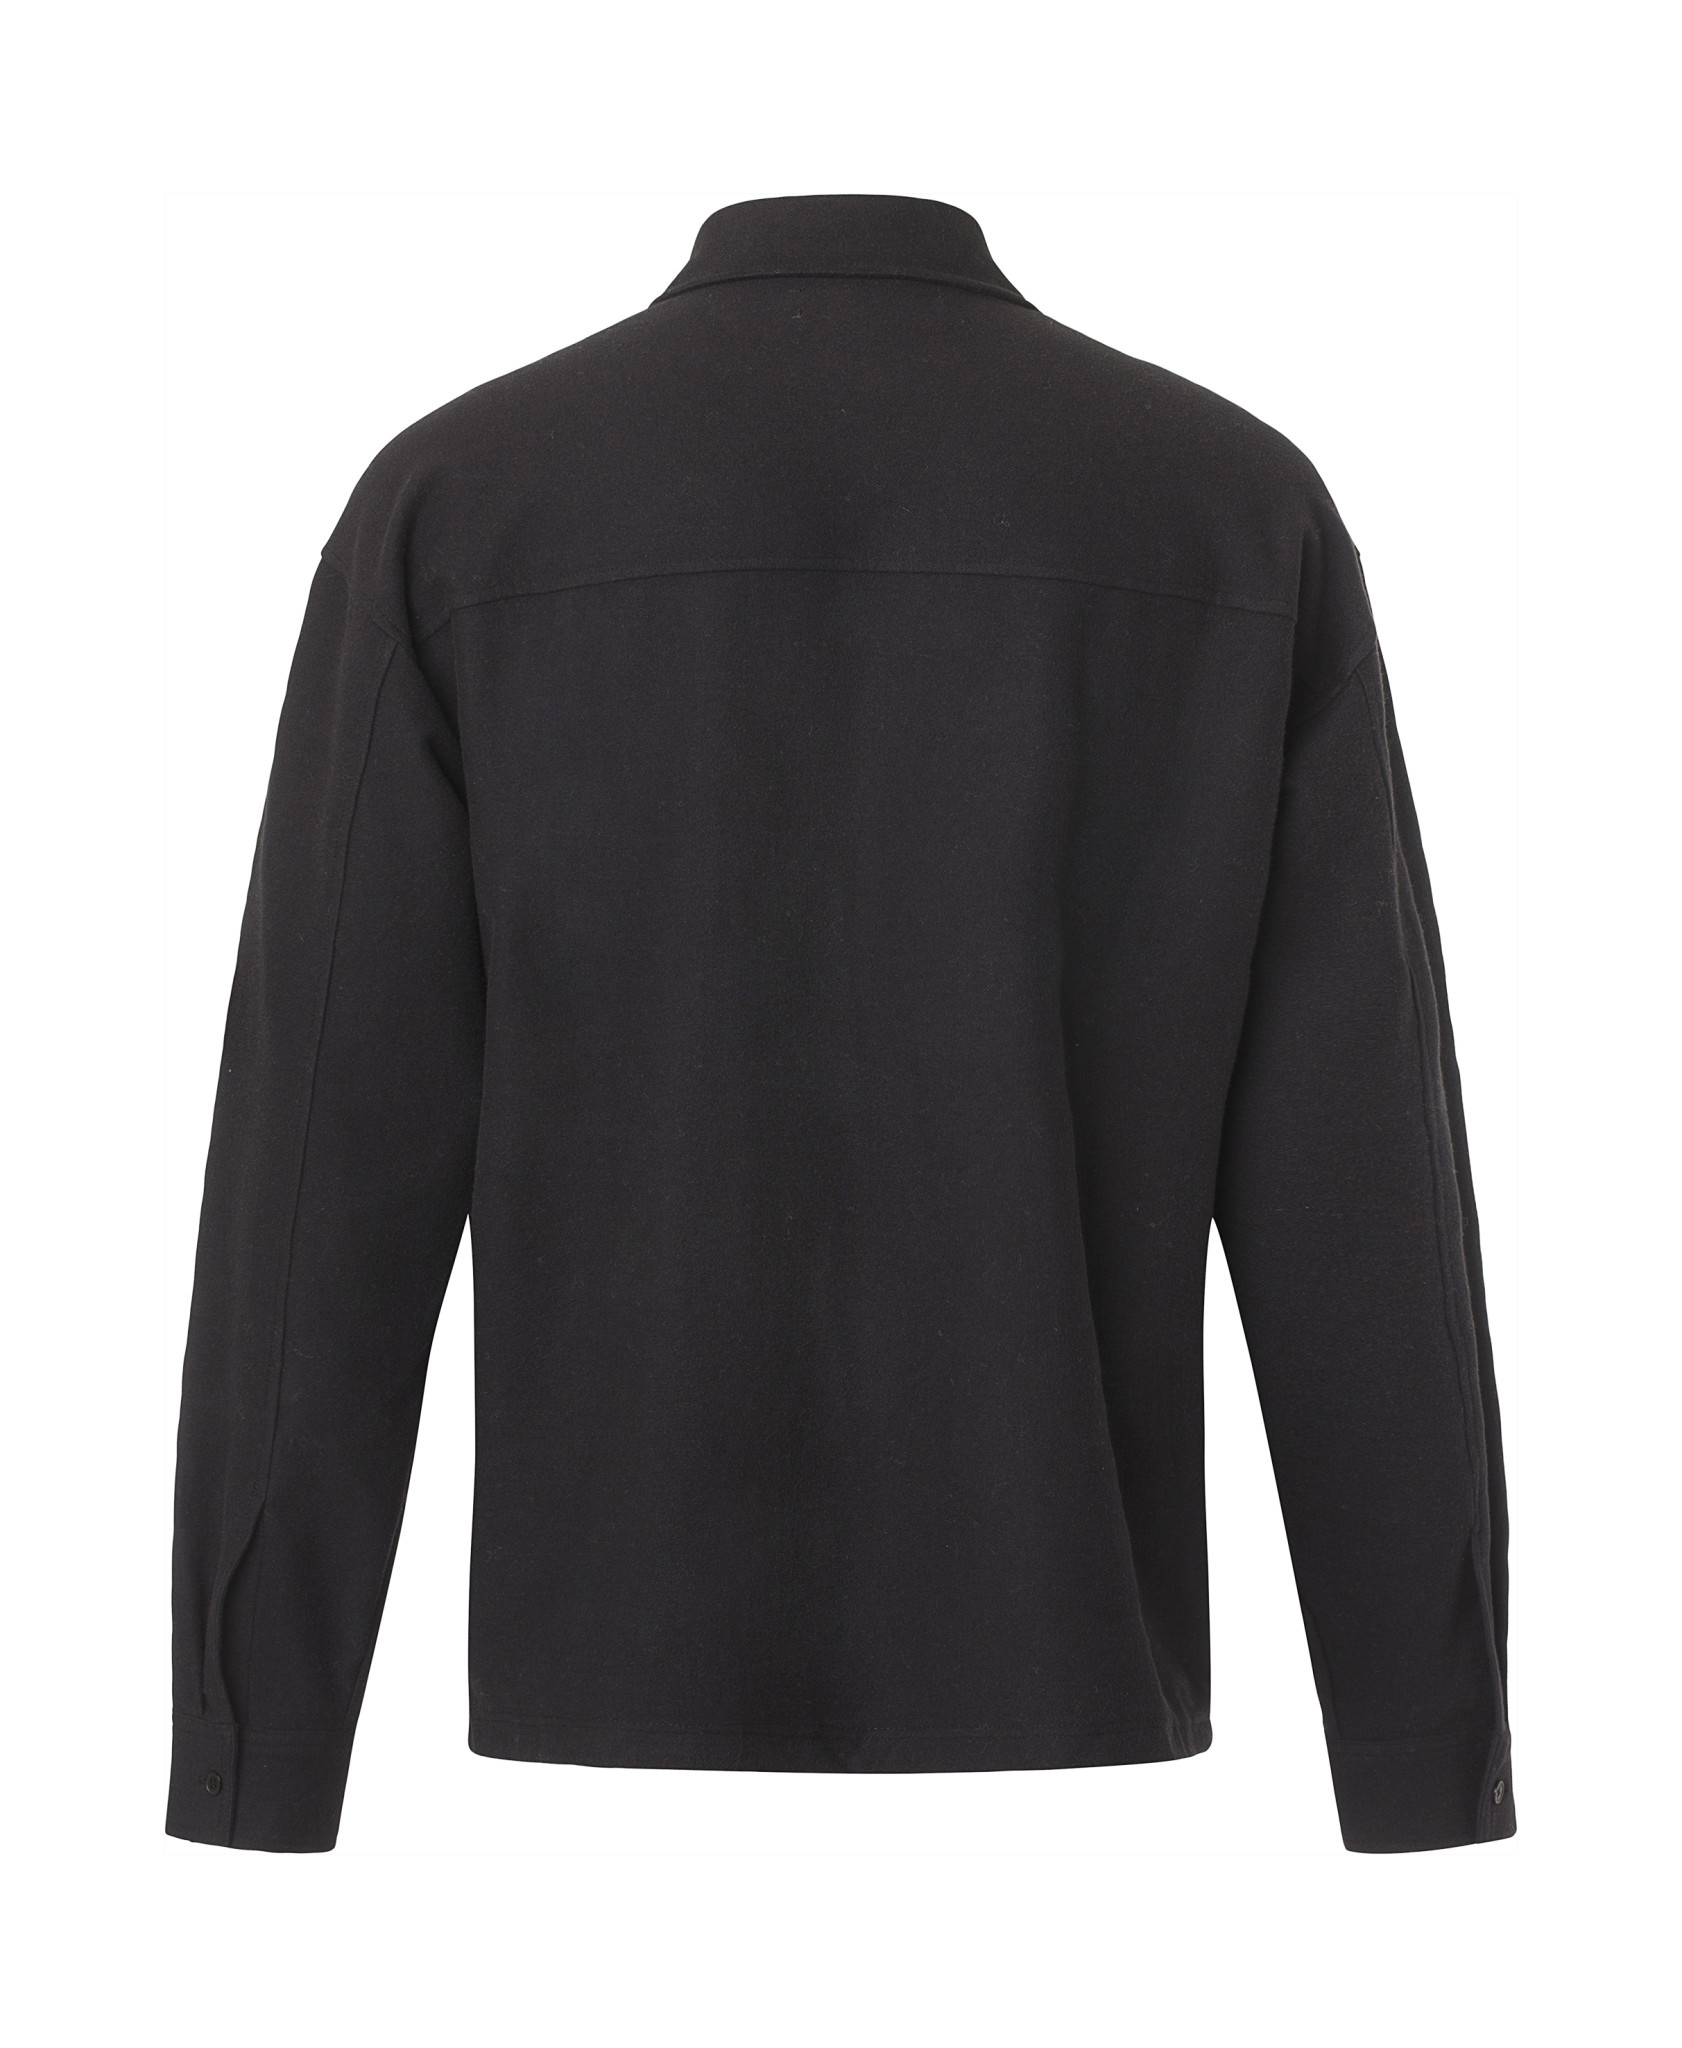 Poule Heavy Overshirt Black-3